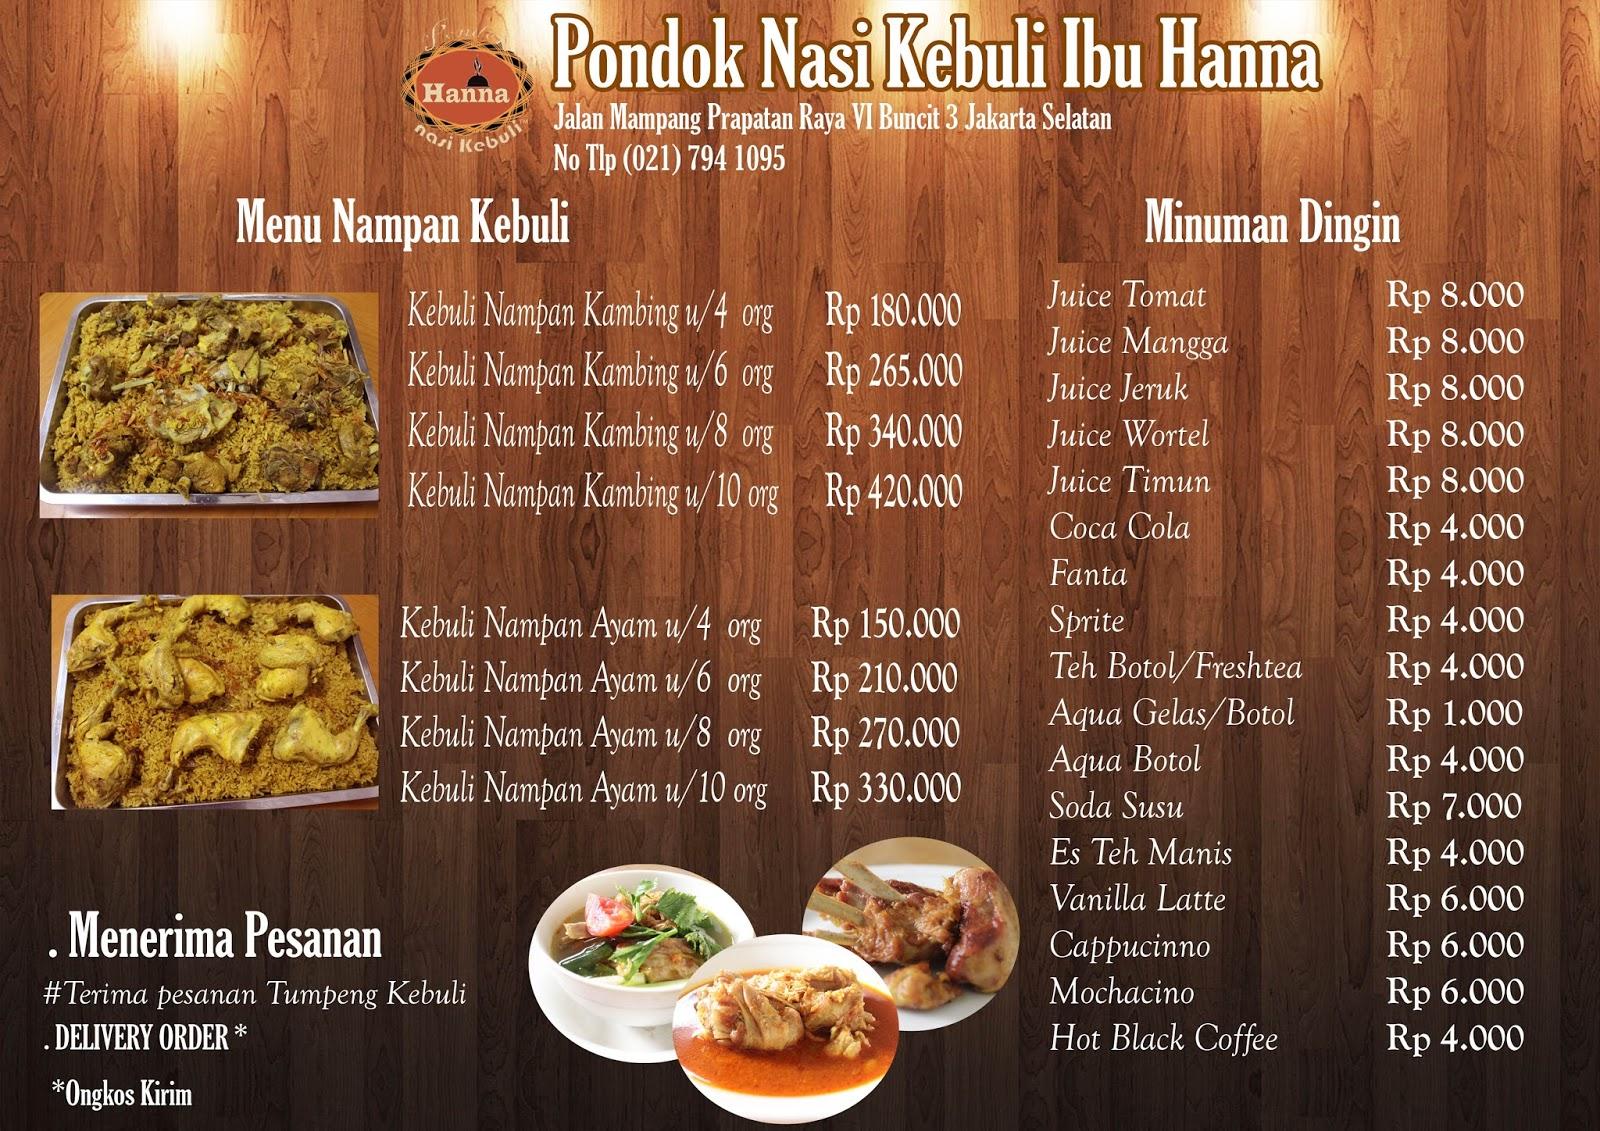 PRICE LIST KEBULI HANNA MAMPANG   Middle East Restaurant